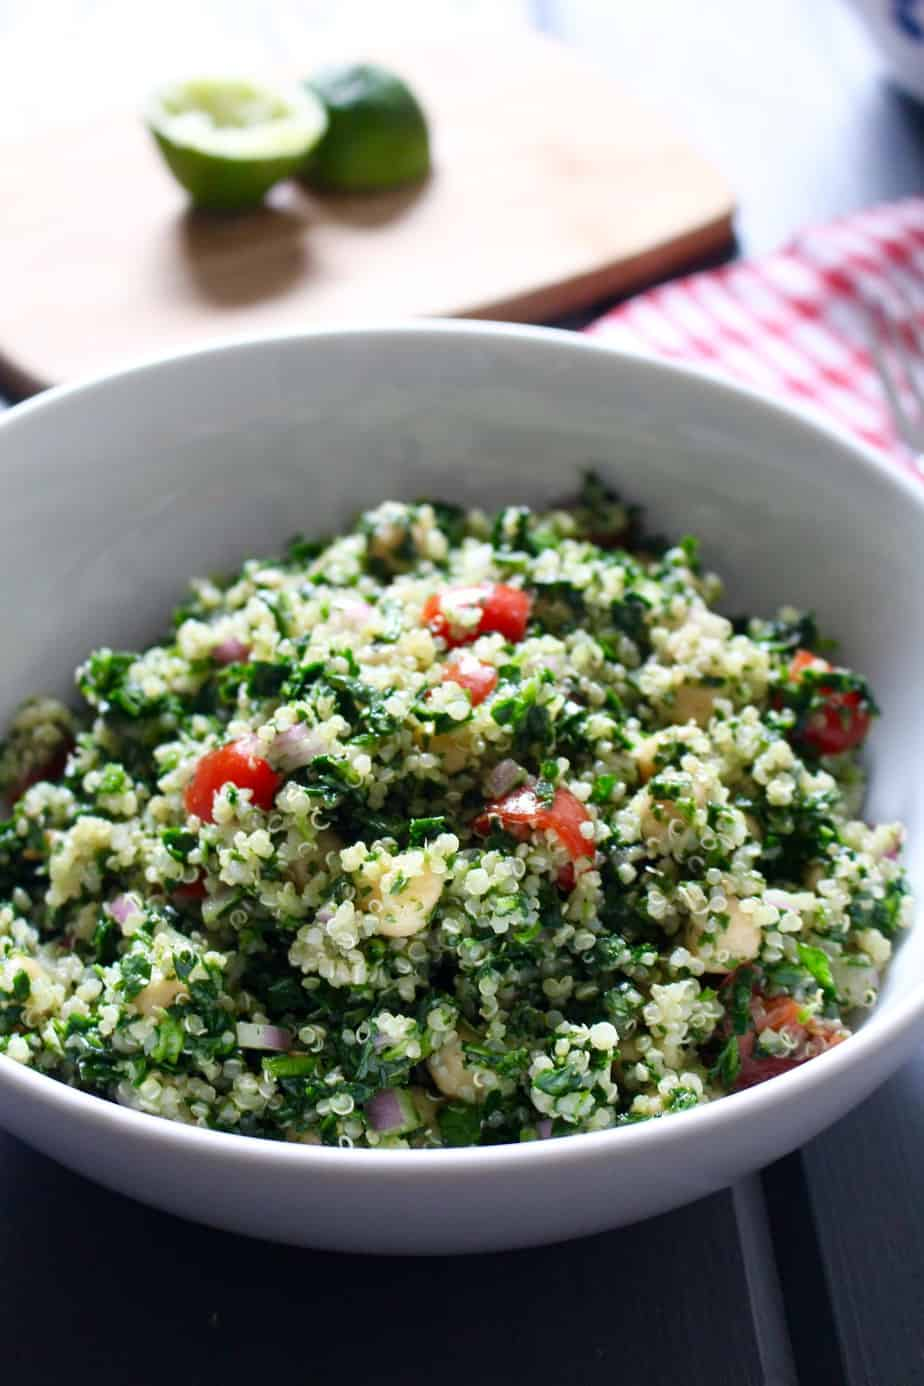 Cilantro Lime Quinoa and Chickpea Salad   Frugal Nutrition #vegan #salad